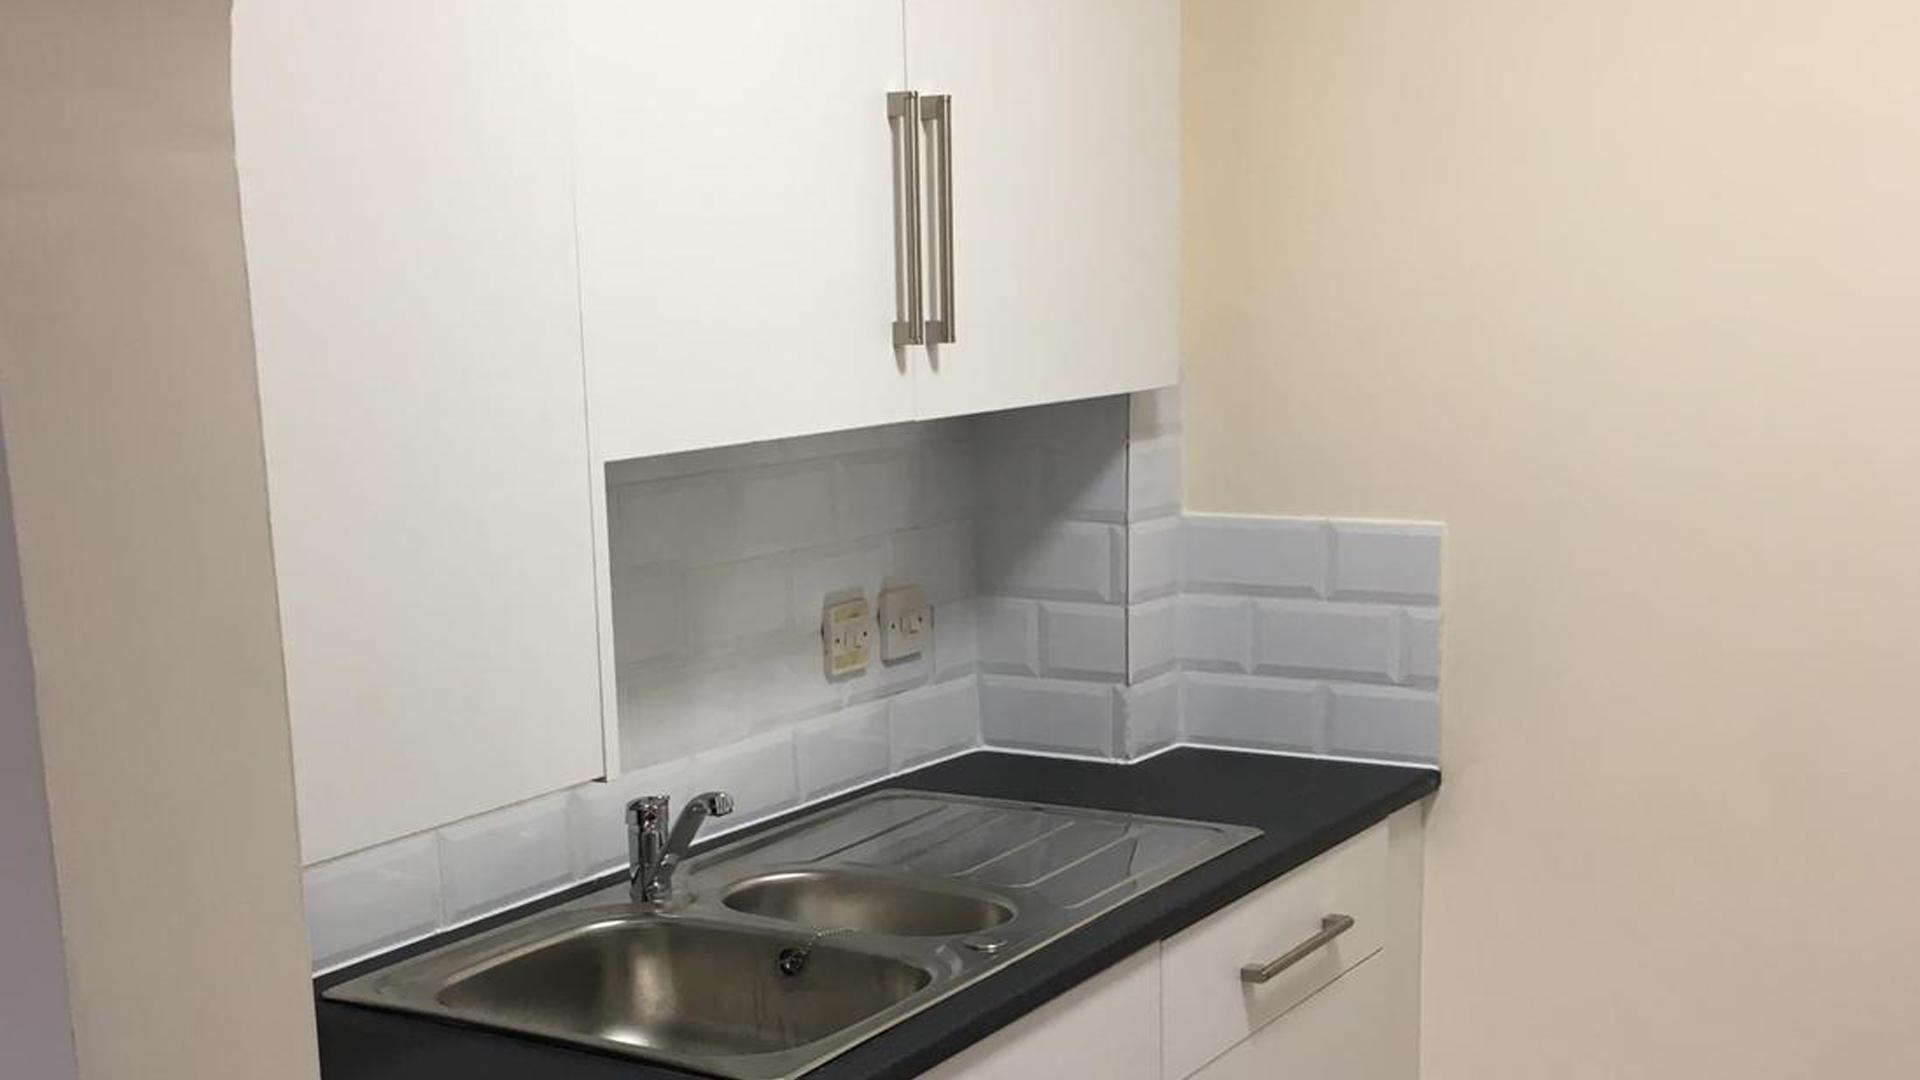 http://www.corepropertysolutions.co.uk/wp-content/uploads/2019/06/kitchen3.jpg